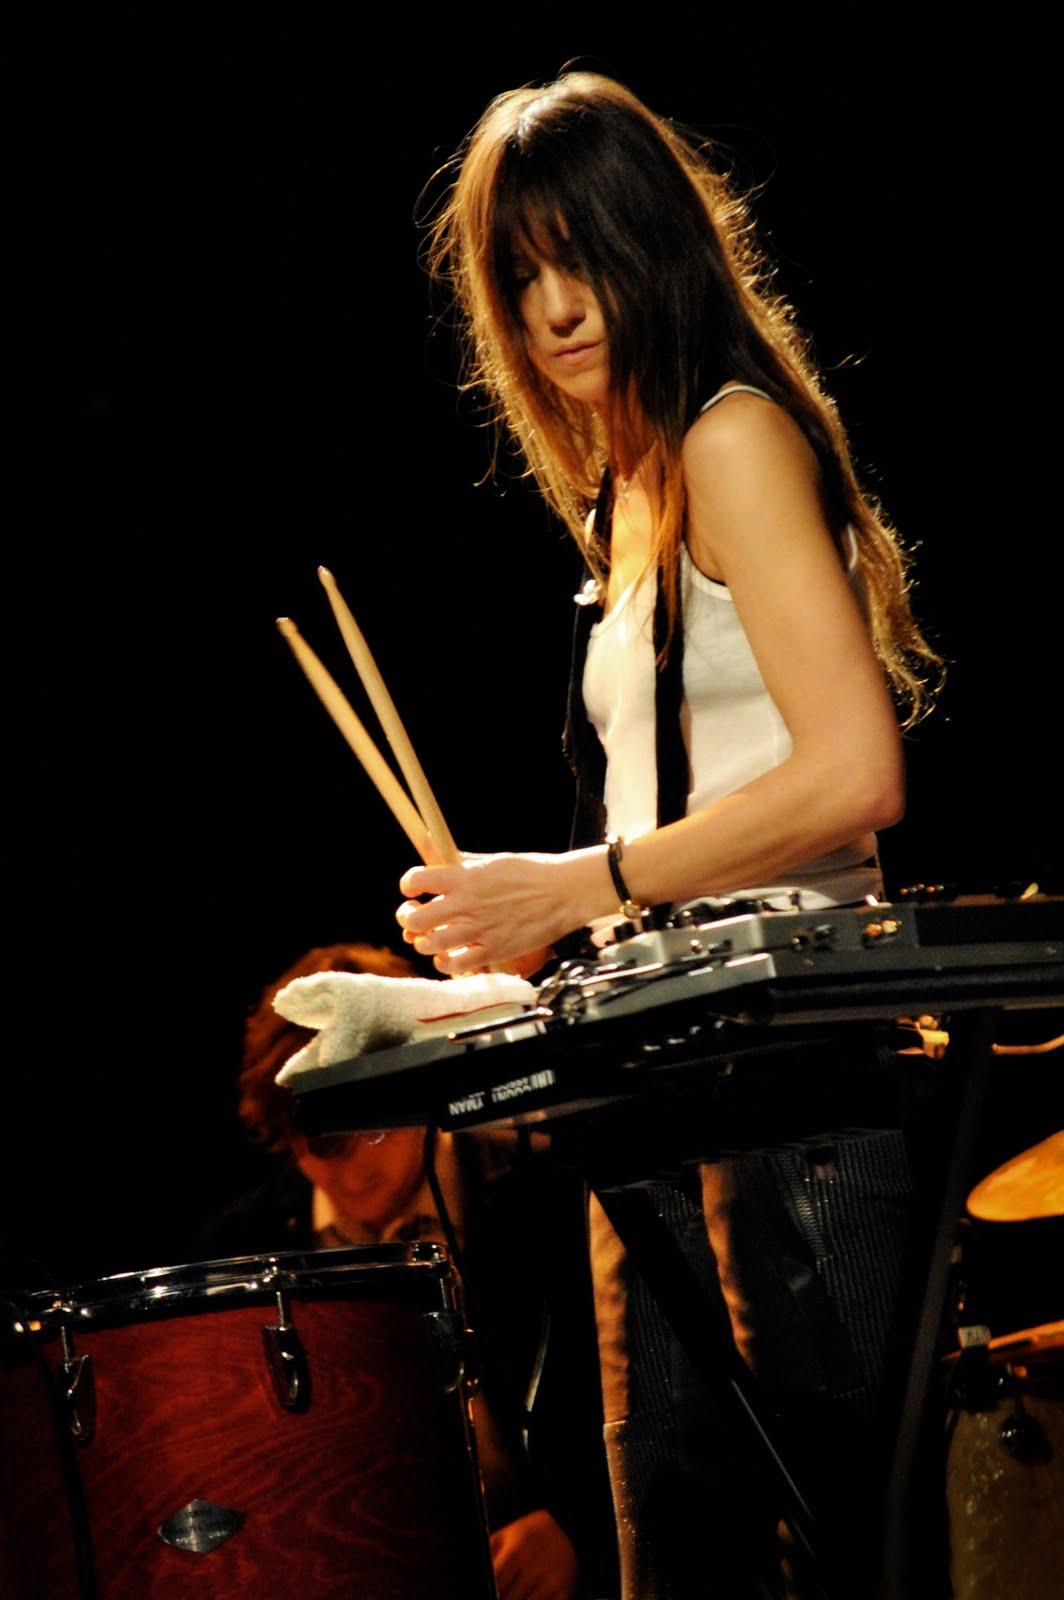 http://2.bp.blogspot.com/_2kzp9TcCdmc/TKoTakA3QnI/AAAAAAAABlQ/E2UcB8uqCYs/s1600/Charlotte-Gainsbourg-concert-photo-2.jpg